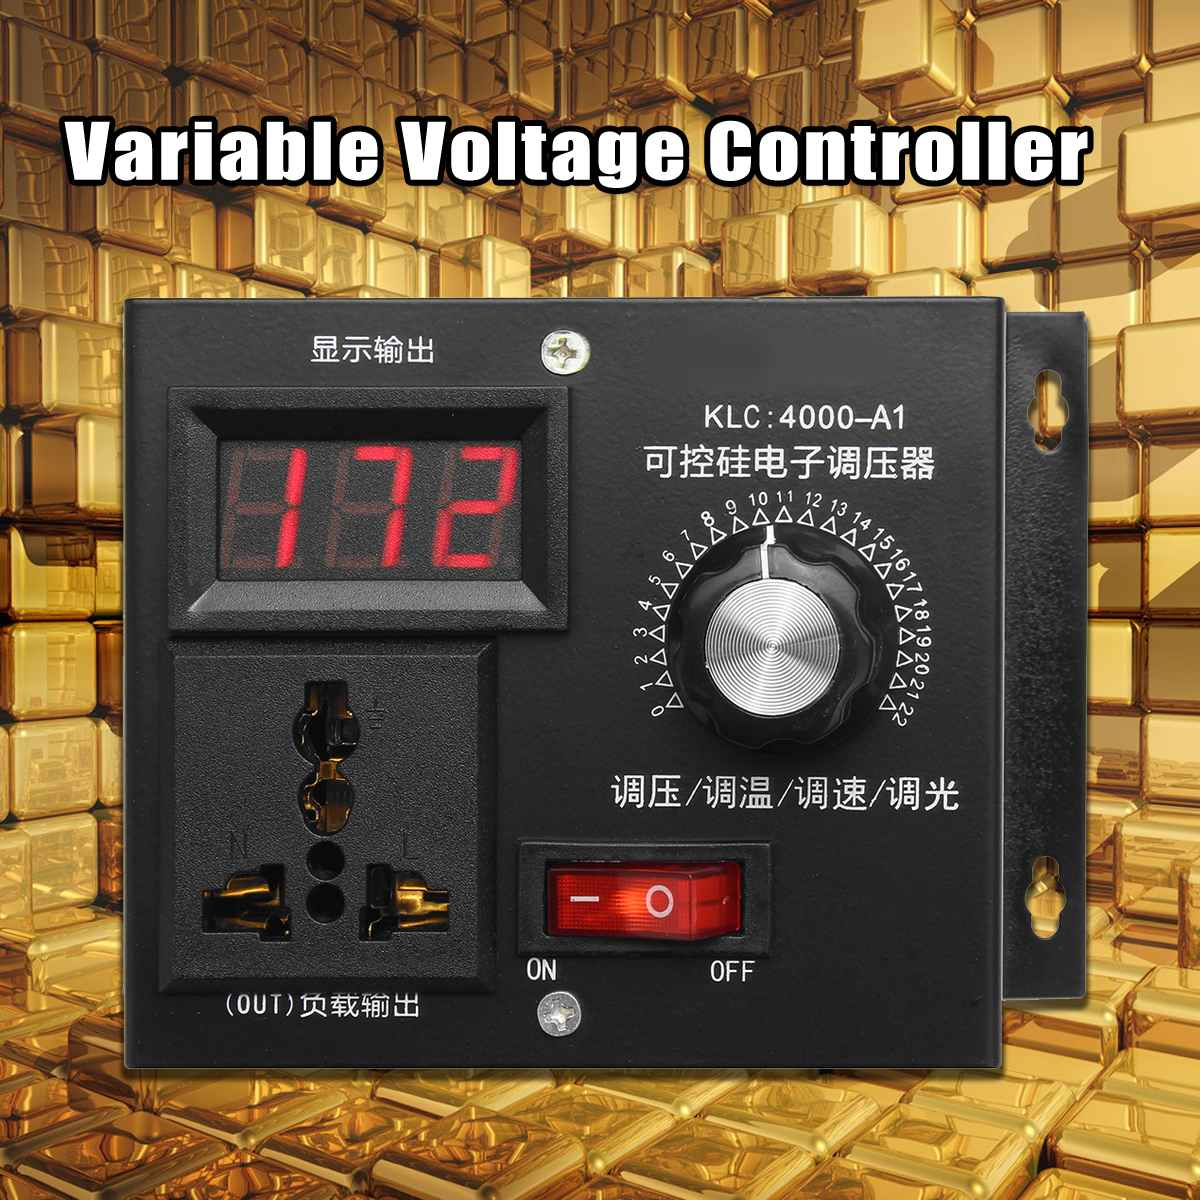 220V 4000W Universal Motor Speed Controller Variable Voltage Speed Regulator LED Display Motor Control Dimmer220V 4000W Universal Motor Speed Controller Variable Voltage Speed Regulator LED Display Motor Control Dimmer